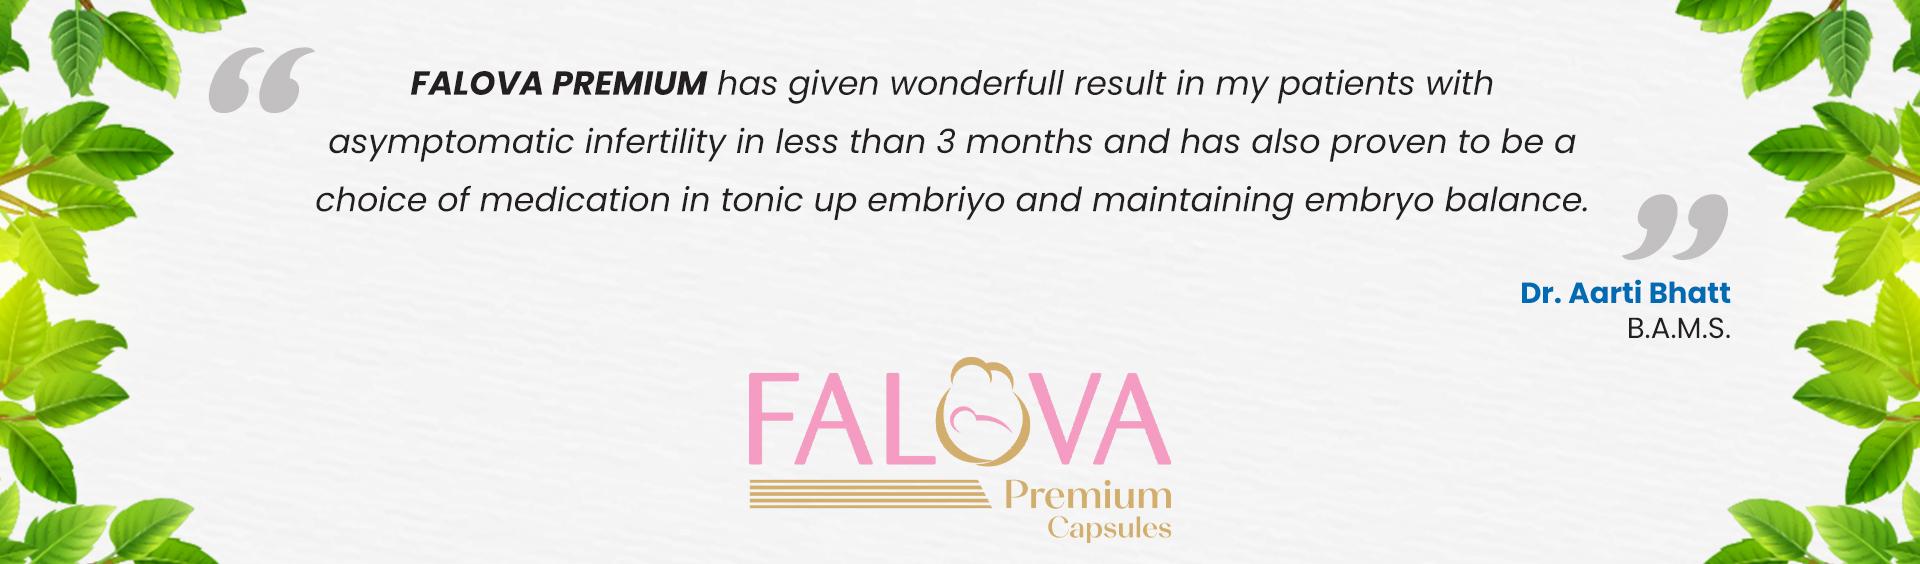 Testimonial-(Falova-Premium)---1920-x-564